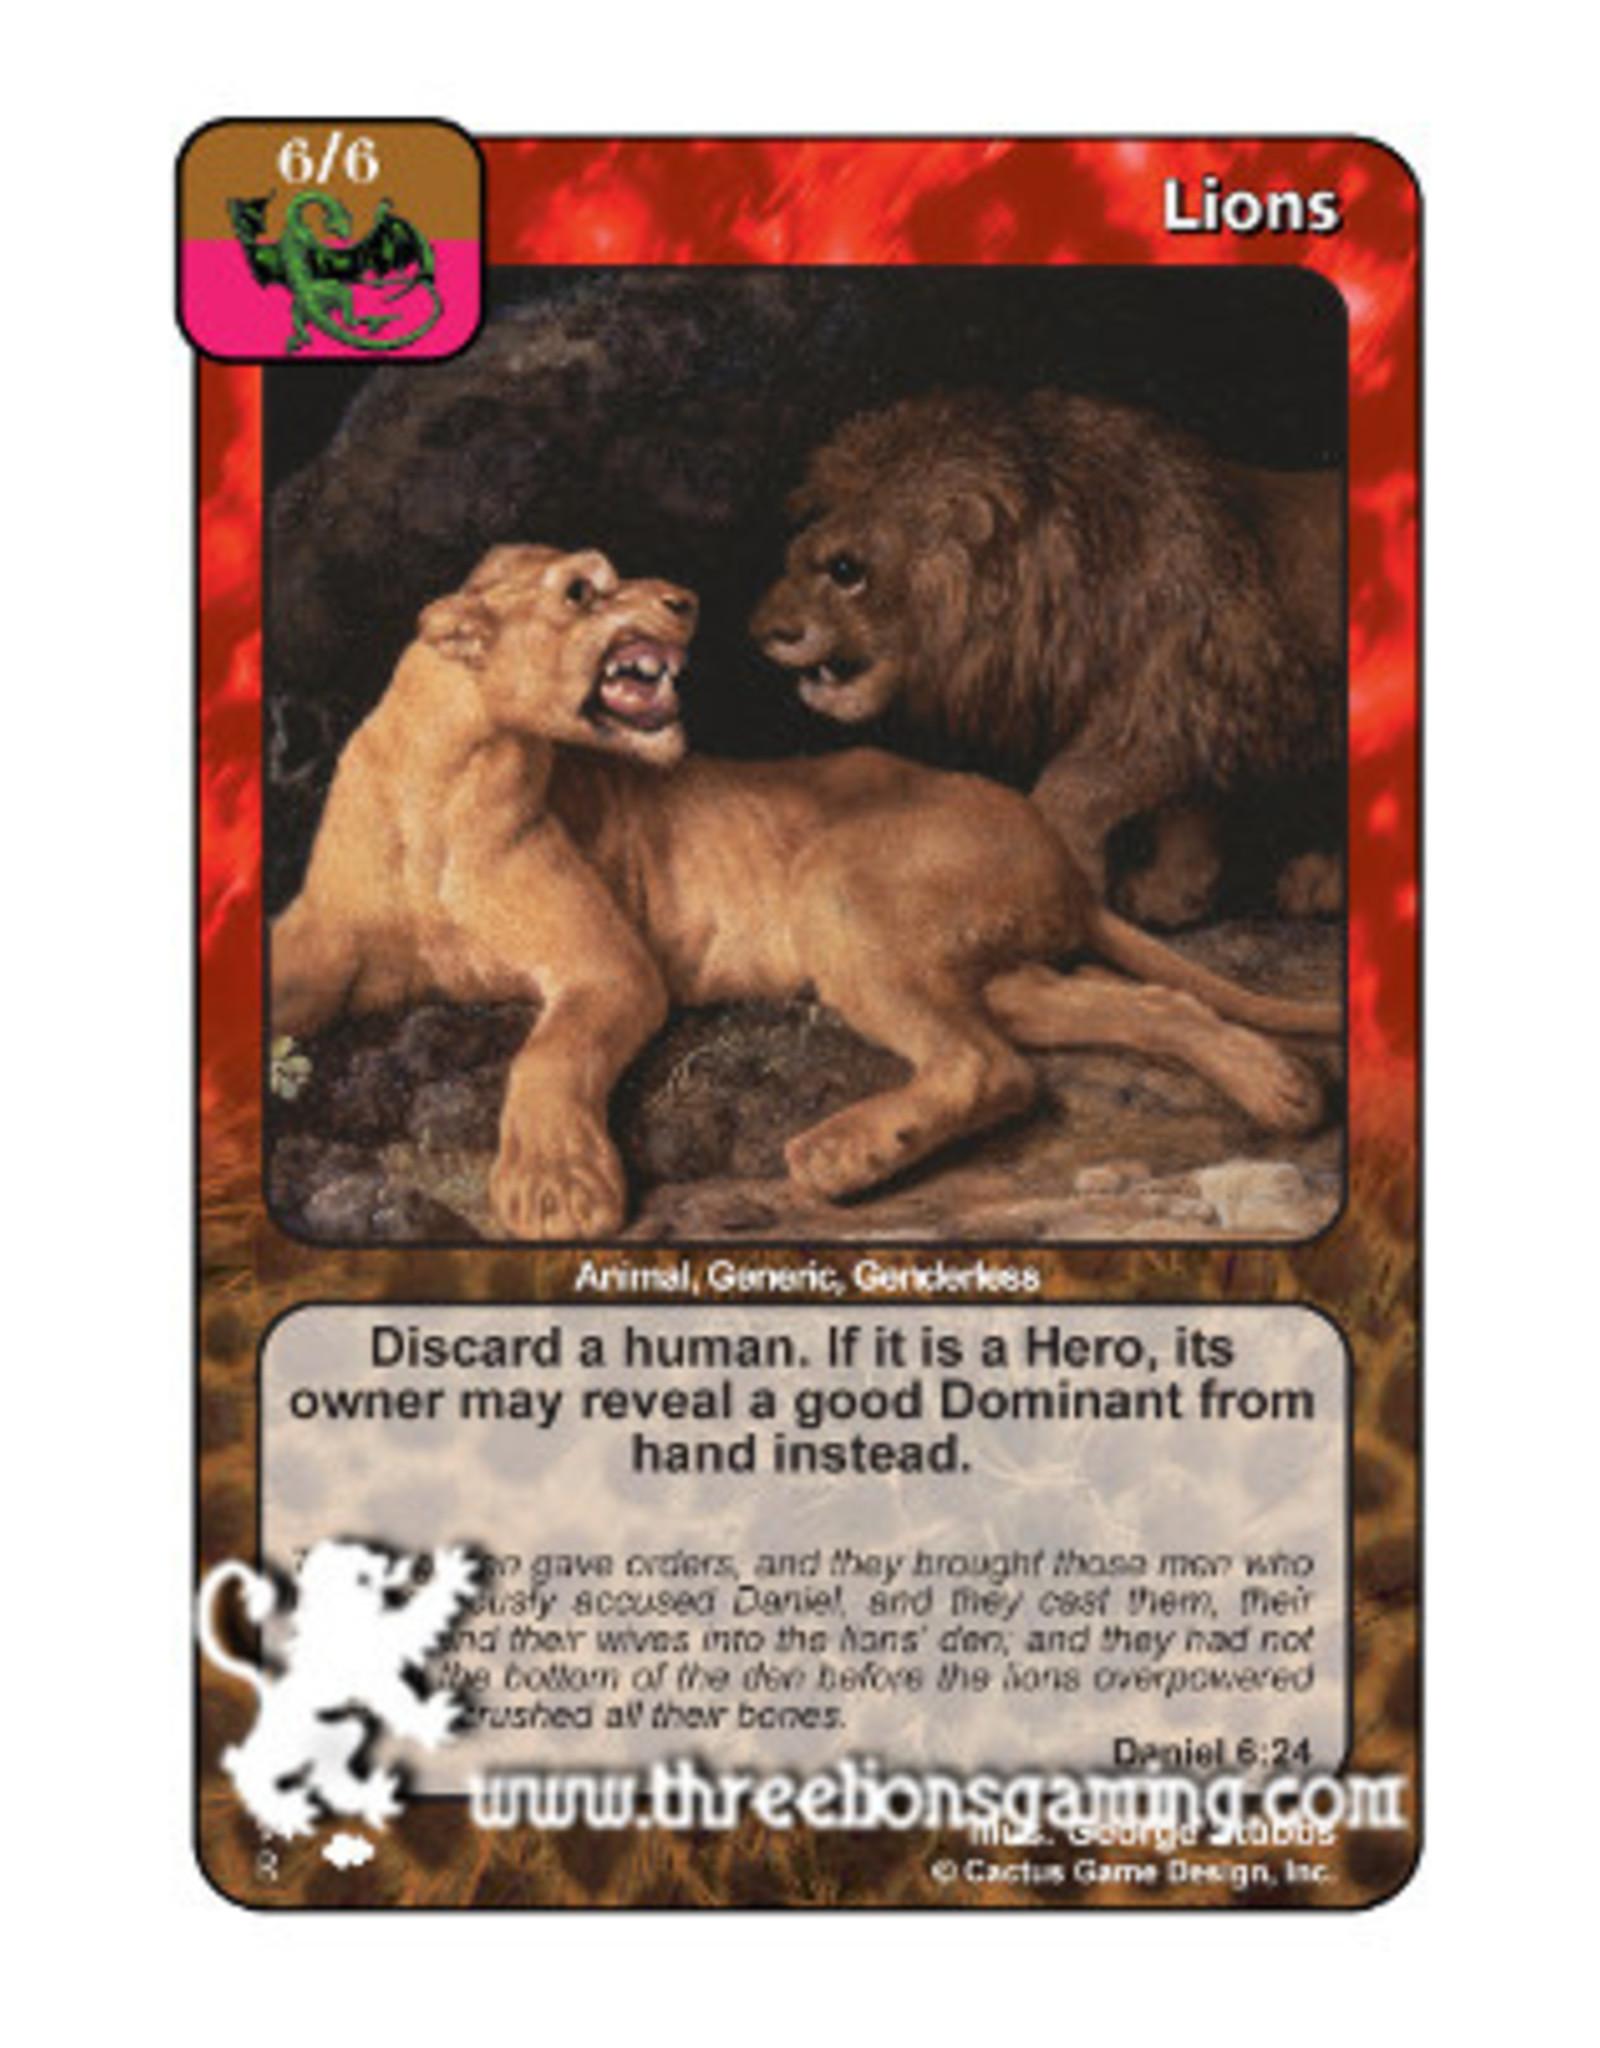 Lions (CW)